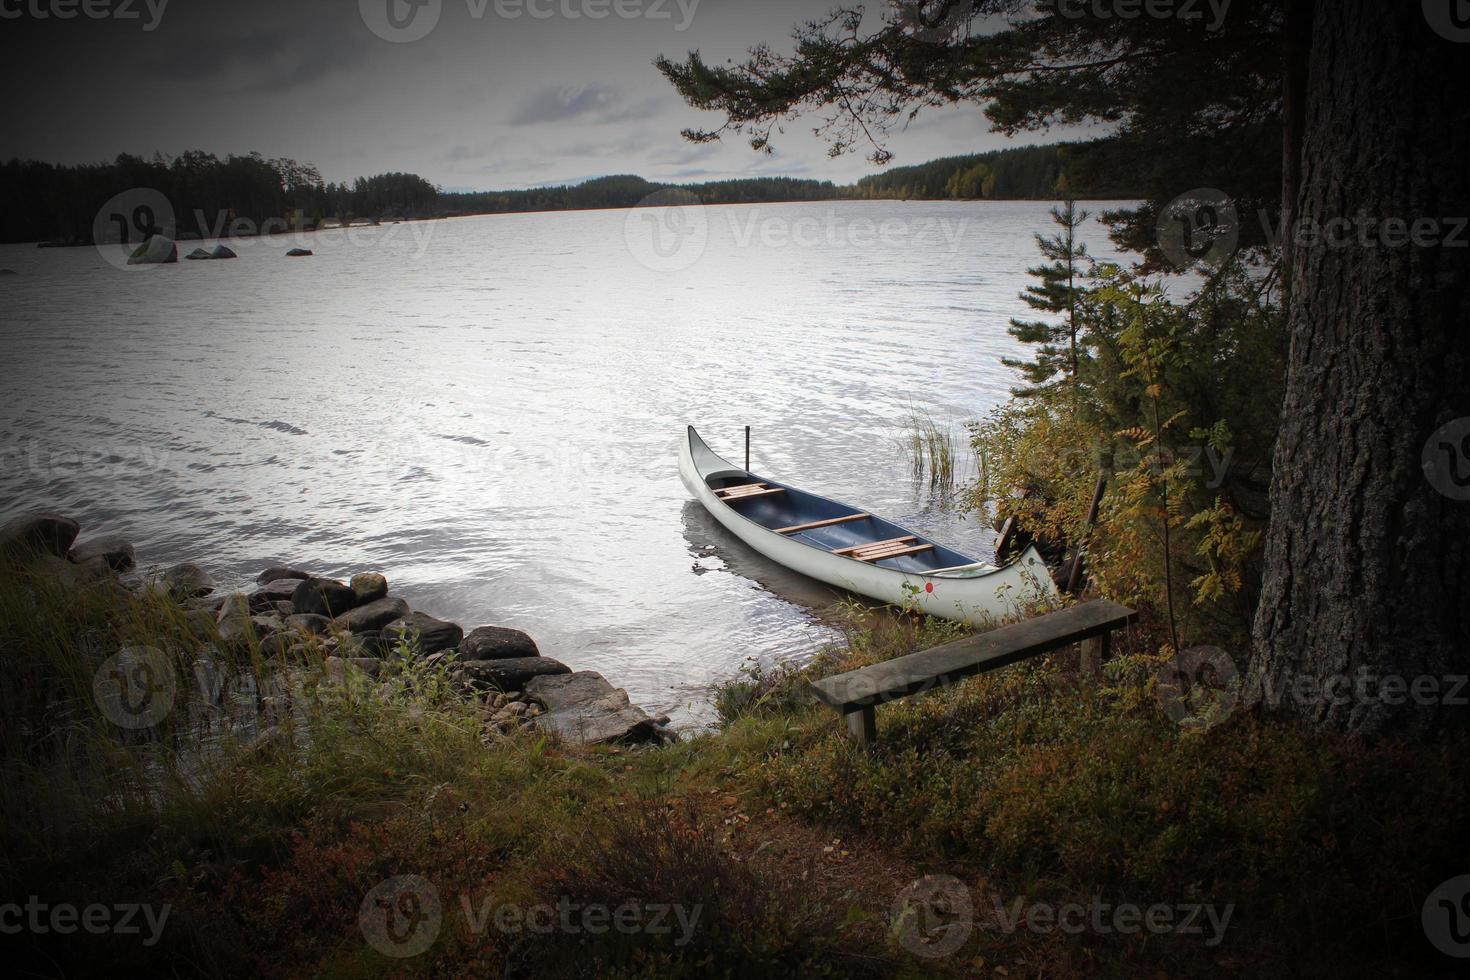 meer met kano foto